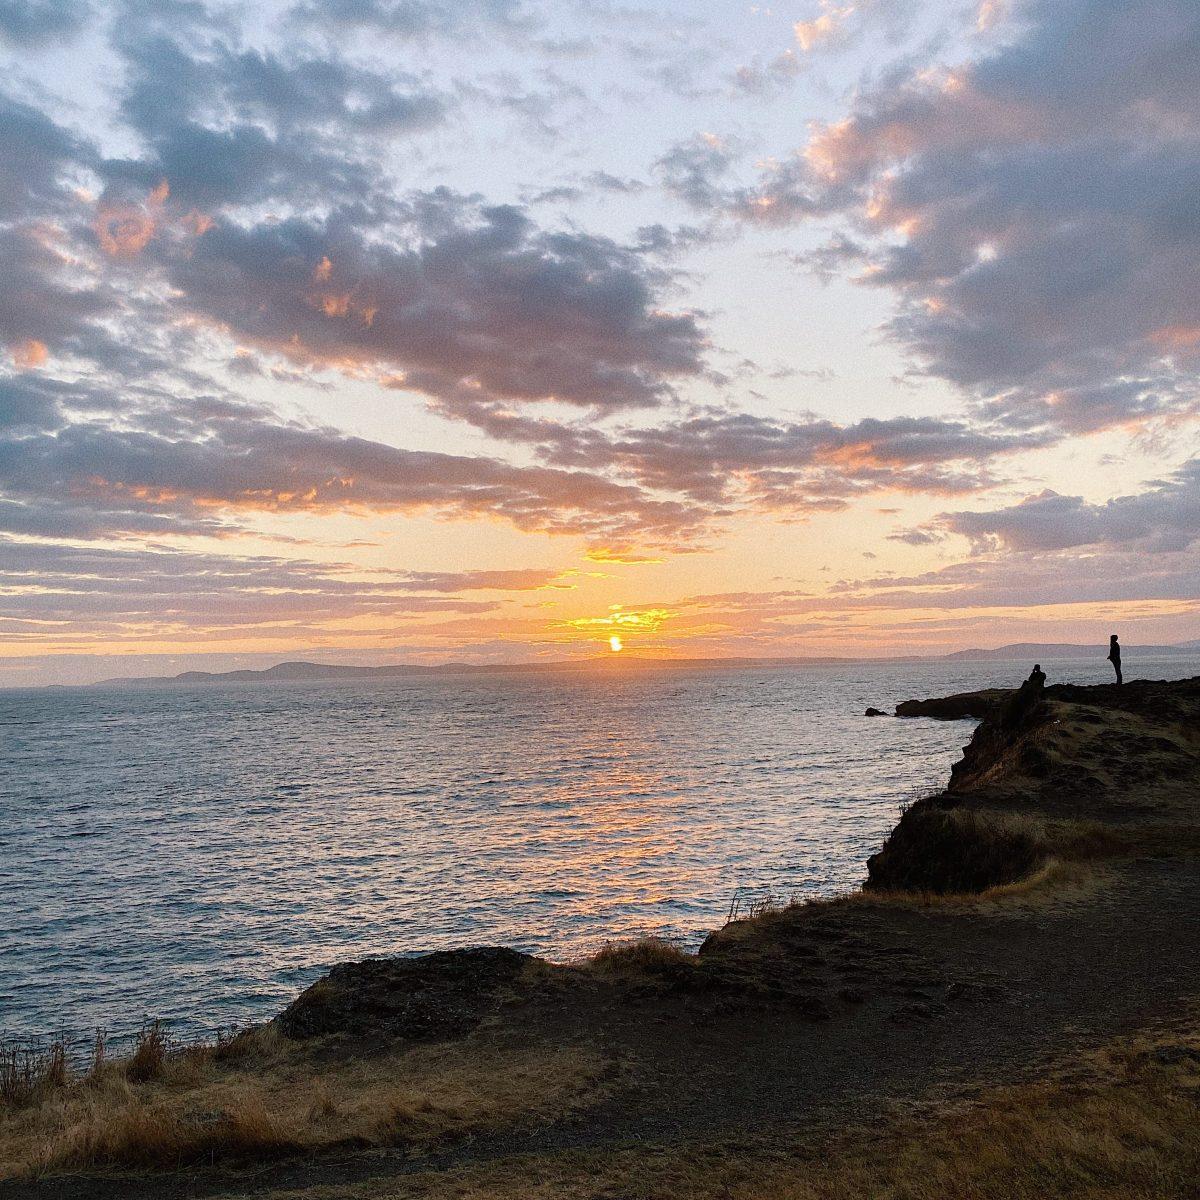 Sunset at Deception Pass State Park